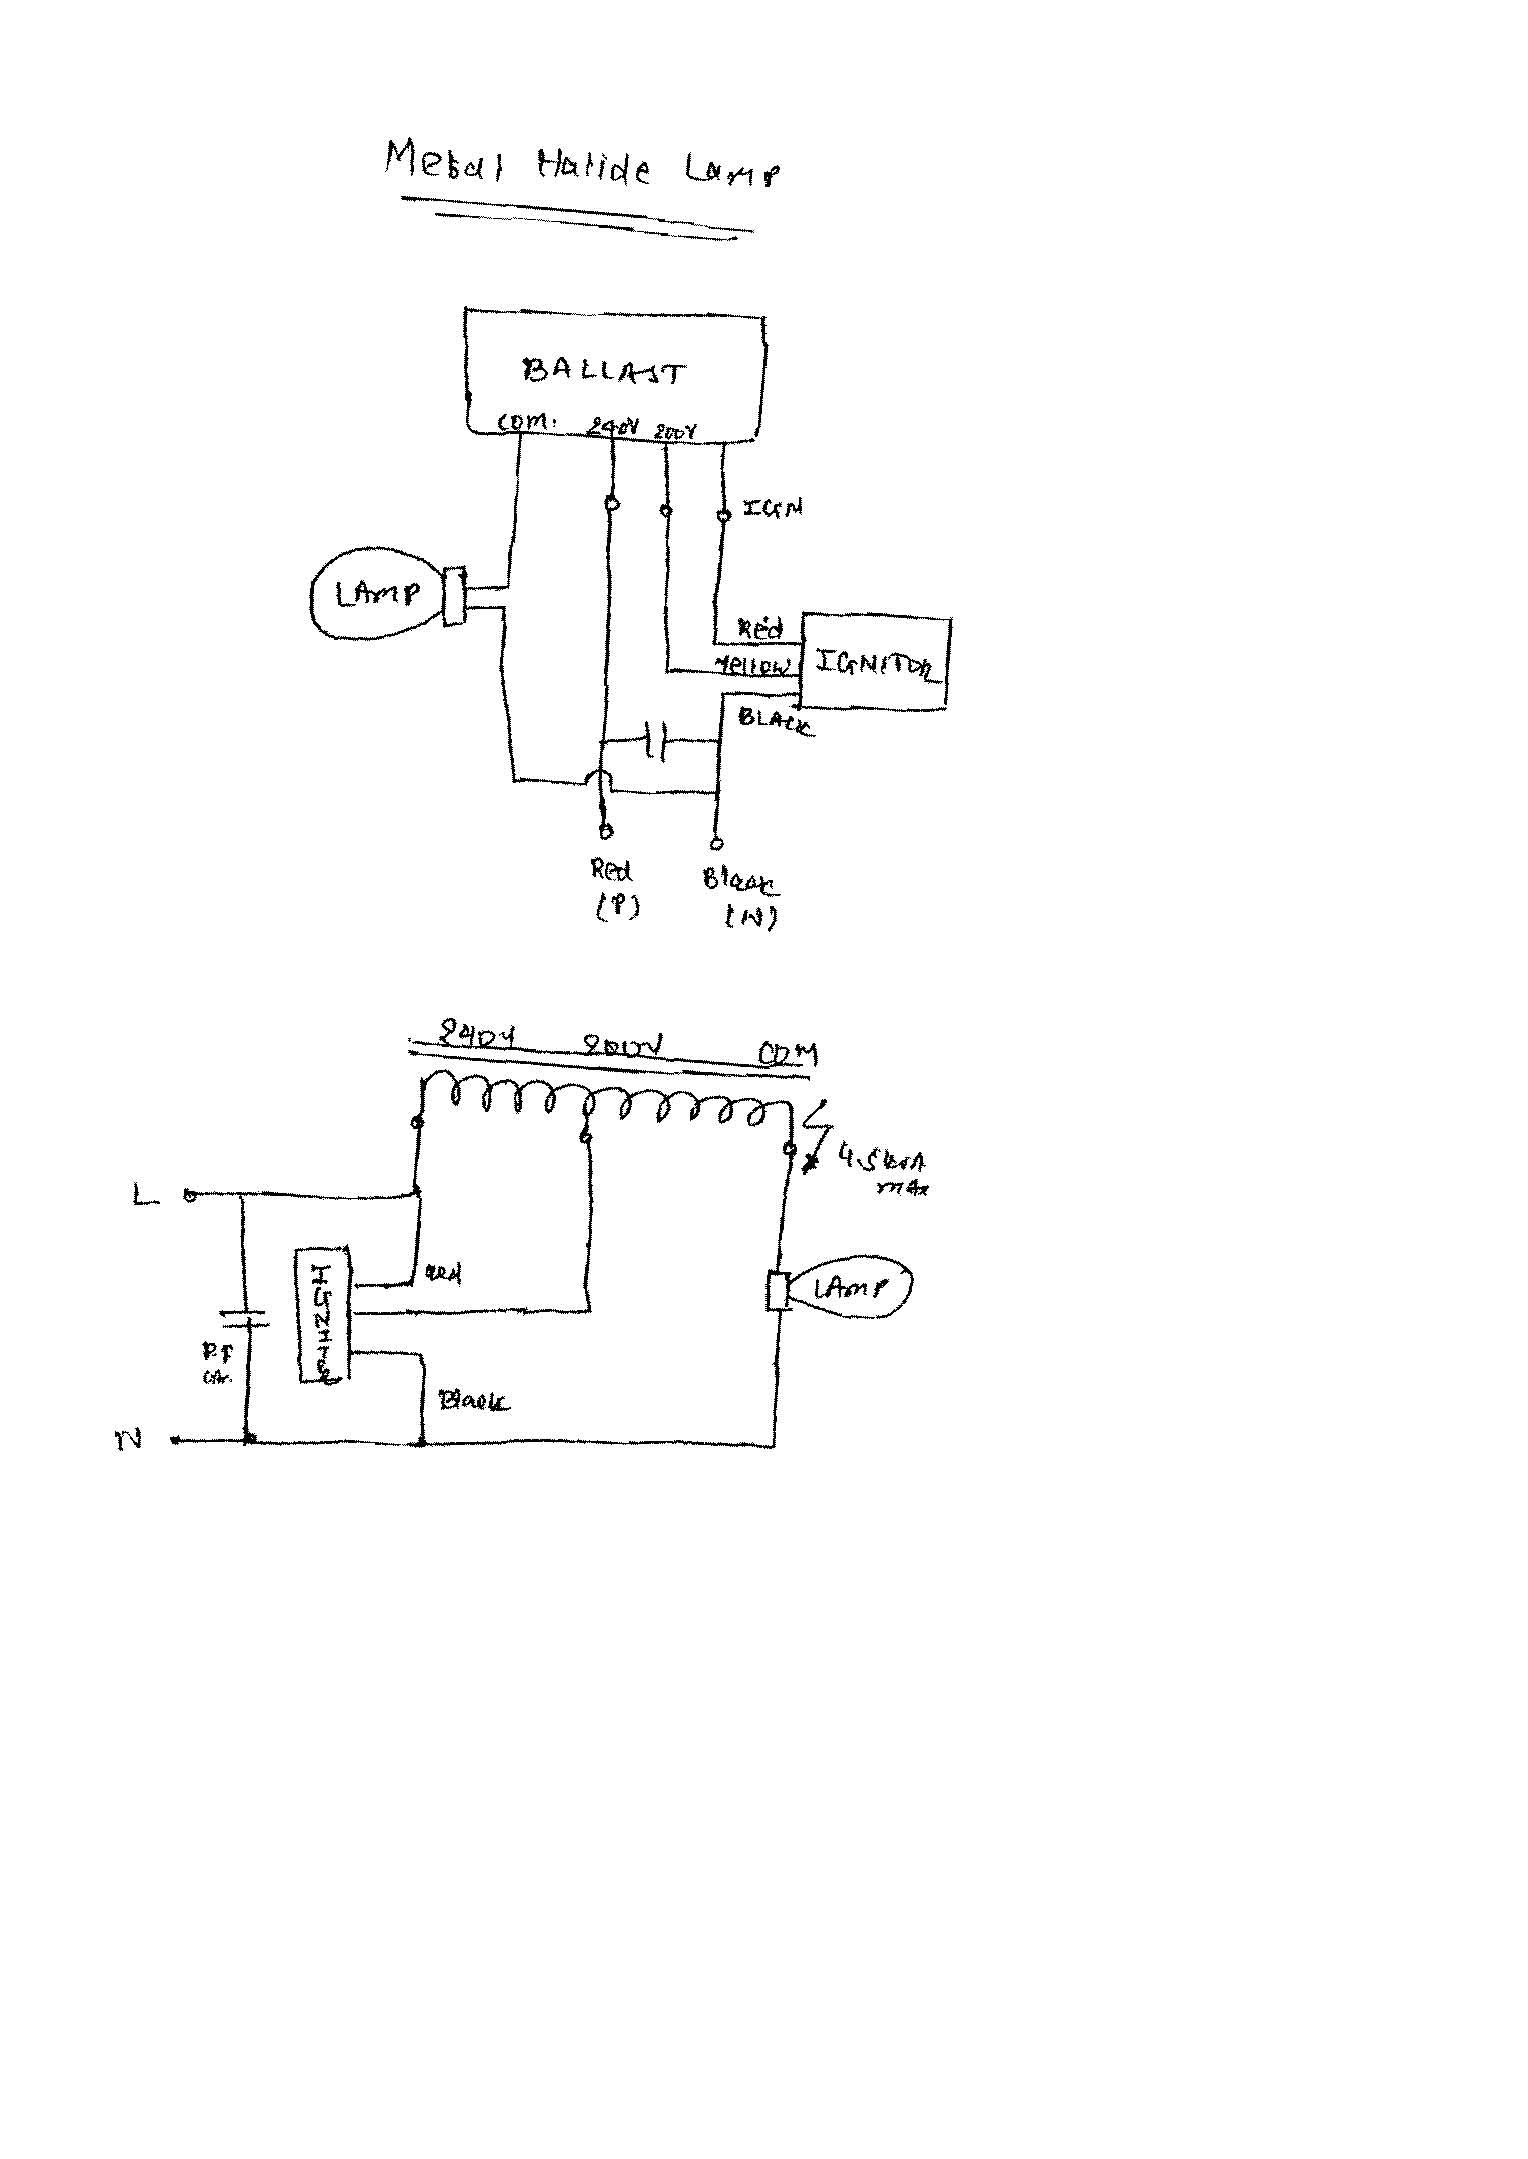 Sodium Light Ballast Diagram Trusted Wiring Ge Electronic Lighting Metal Halide Diagrams T12 Lamp